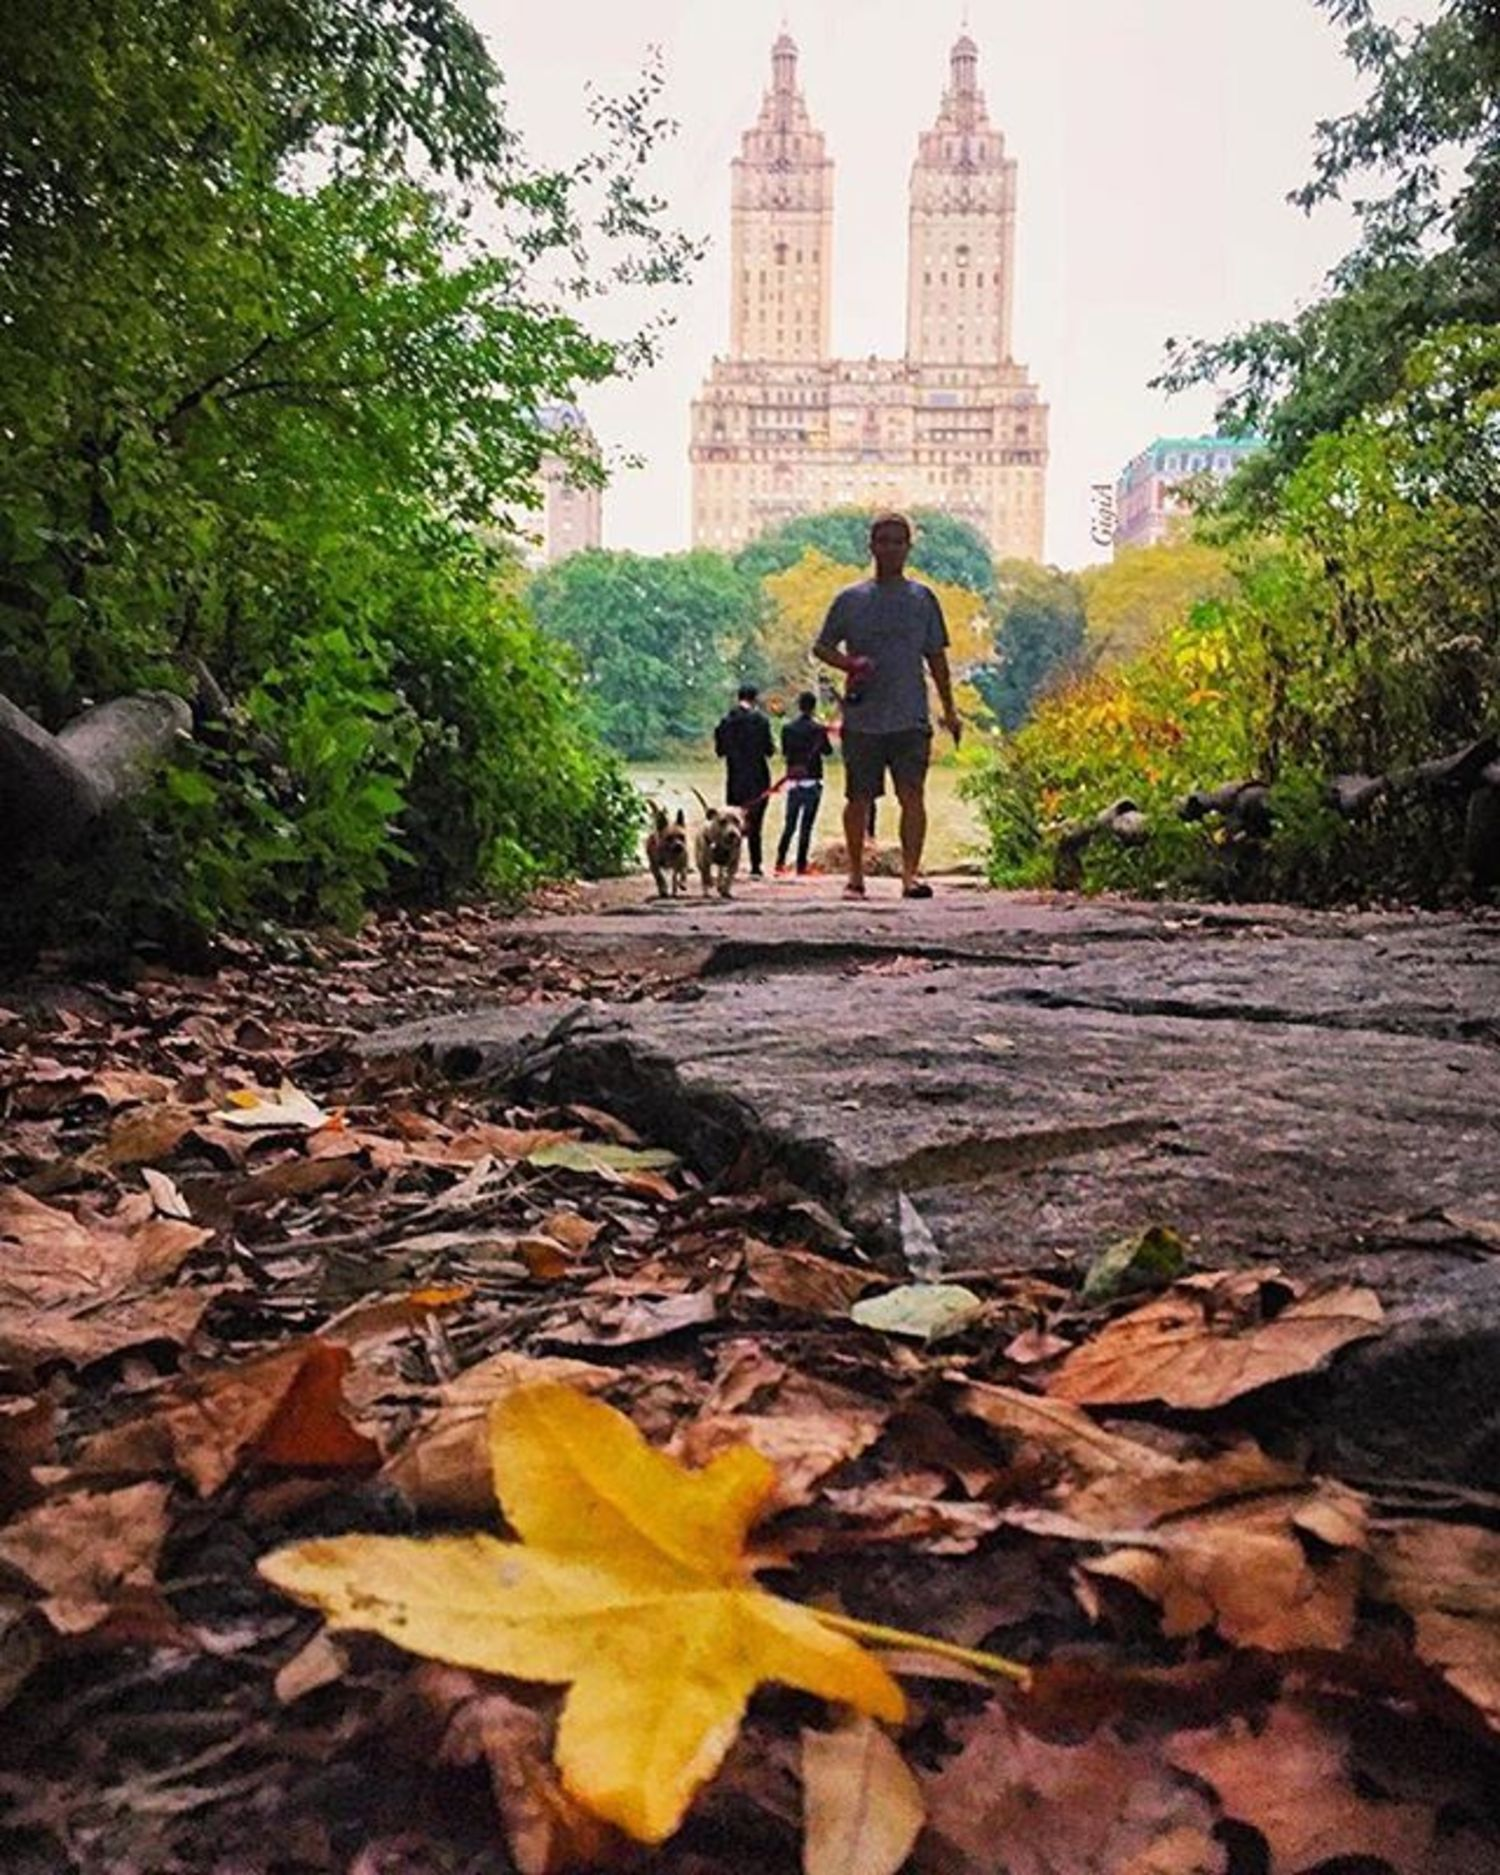 Central Park, New York. Photo via @gigi.nyc #viewingnyc #newyorkcity #newyork #nyc